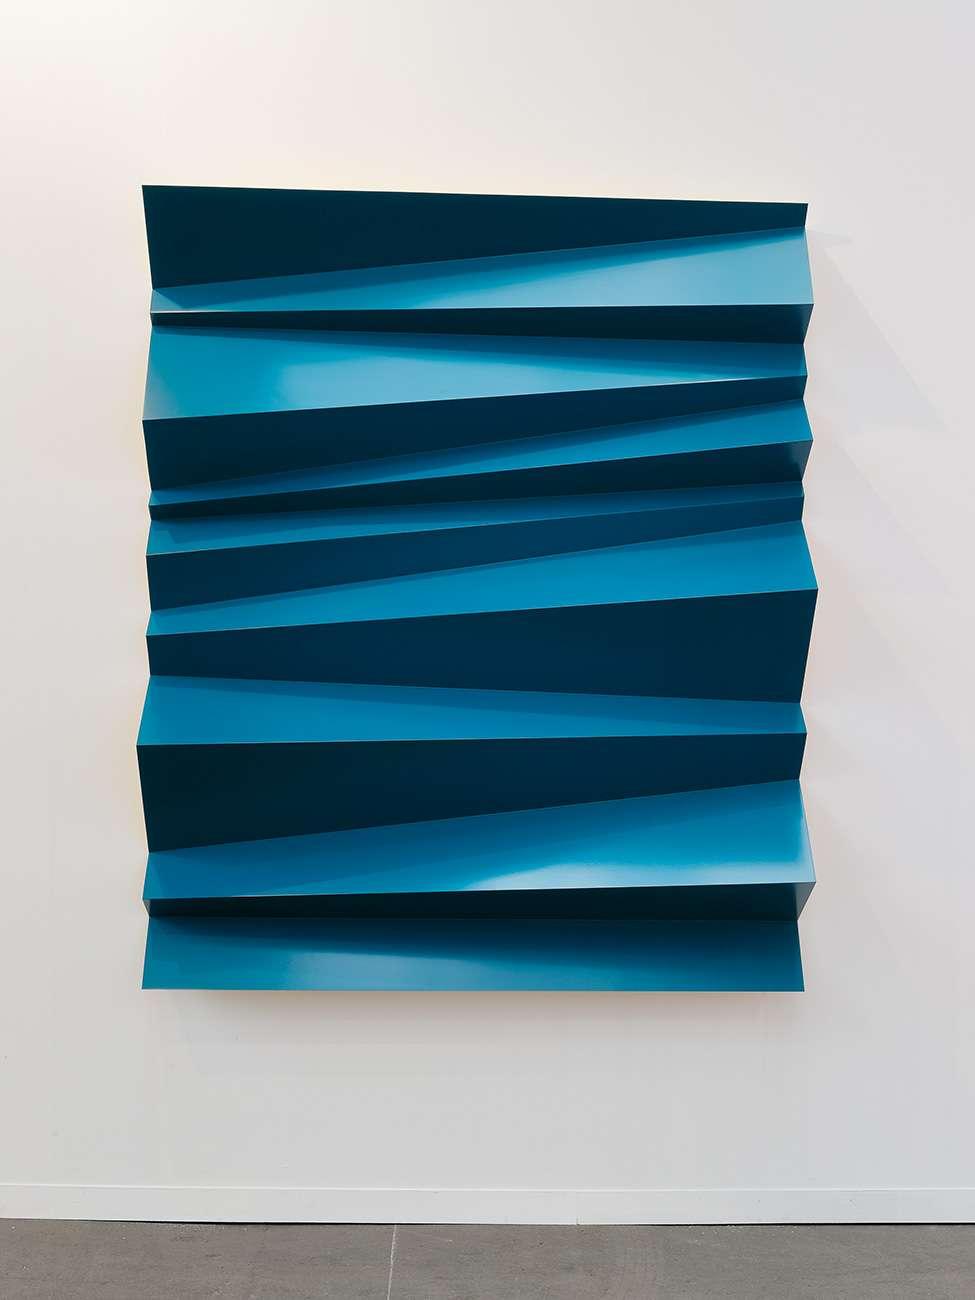 Art Brussels 2019 (BE)Salvatore Arancio, Amélie Bertrand, William S. Burroughs, Françoise Pétrovitch & Beat Zoderer 25 — 28 avril 2019